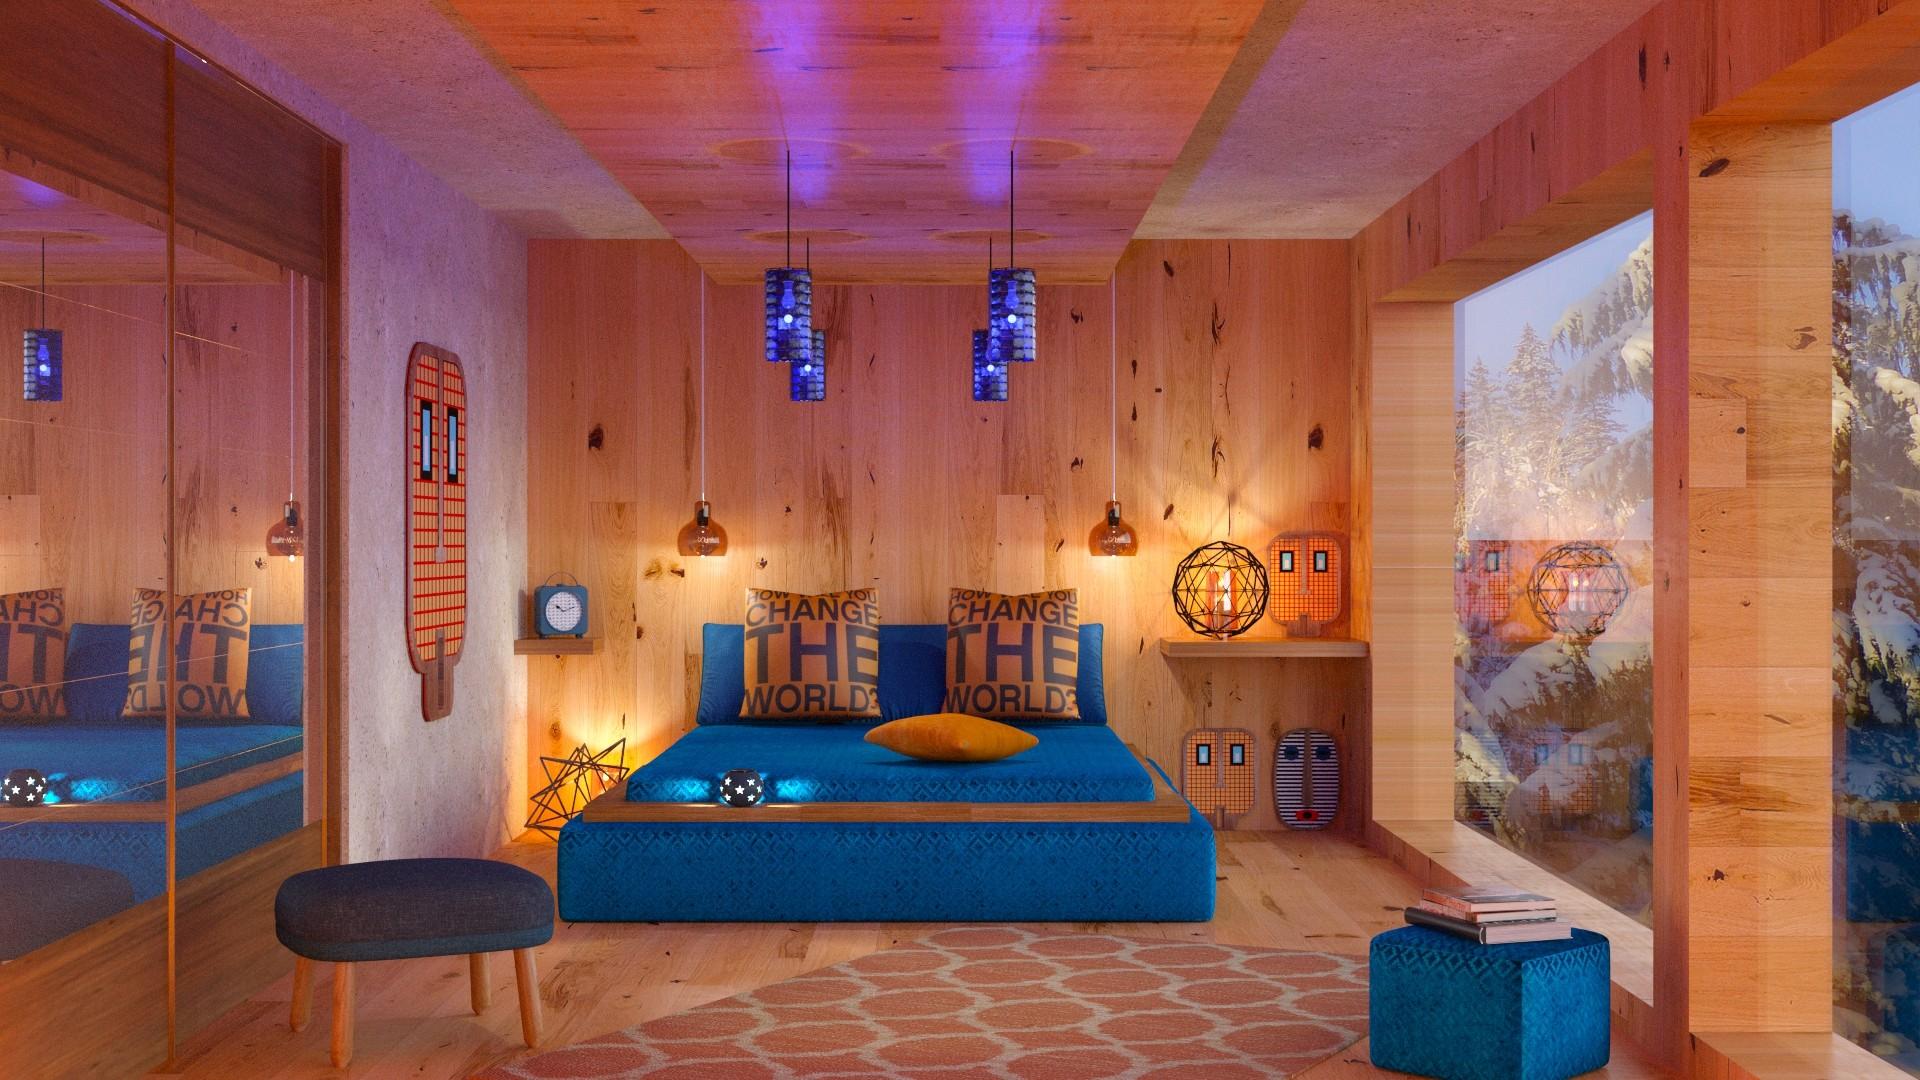 Orange Blue Bedroom contest on Roomstyler